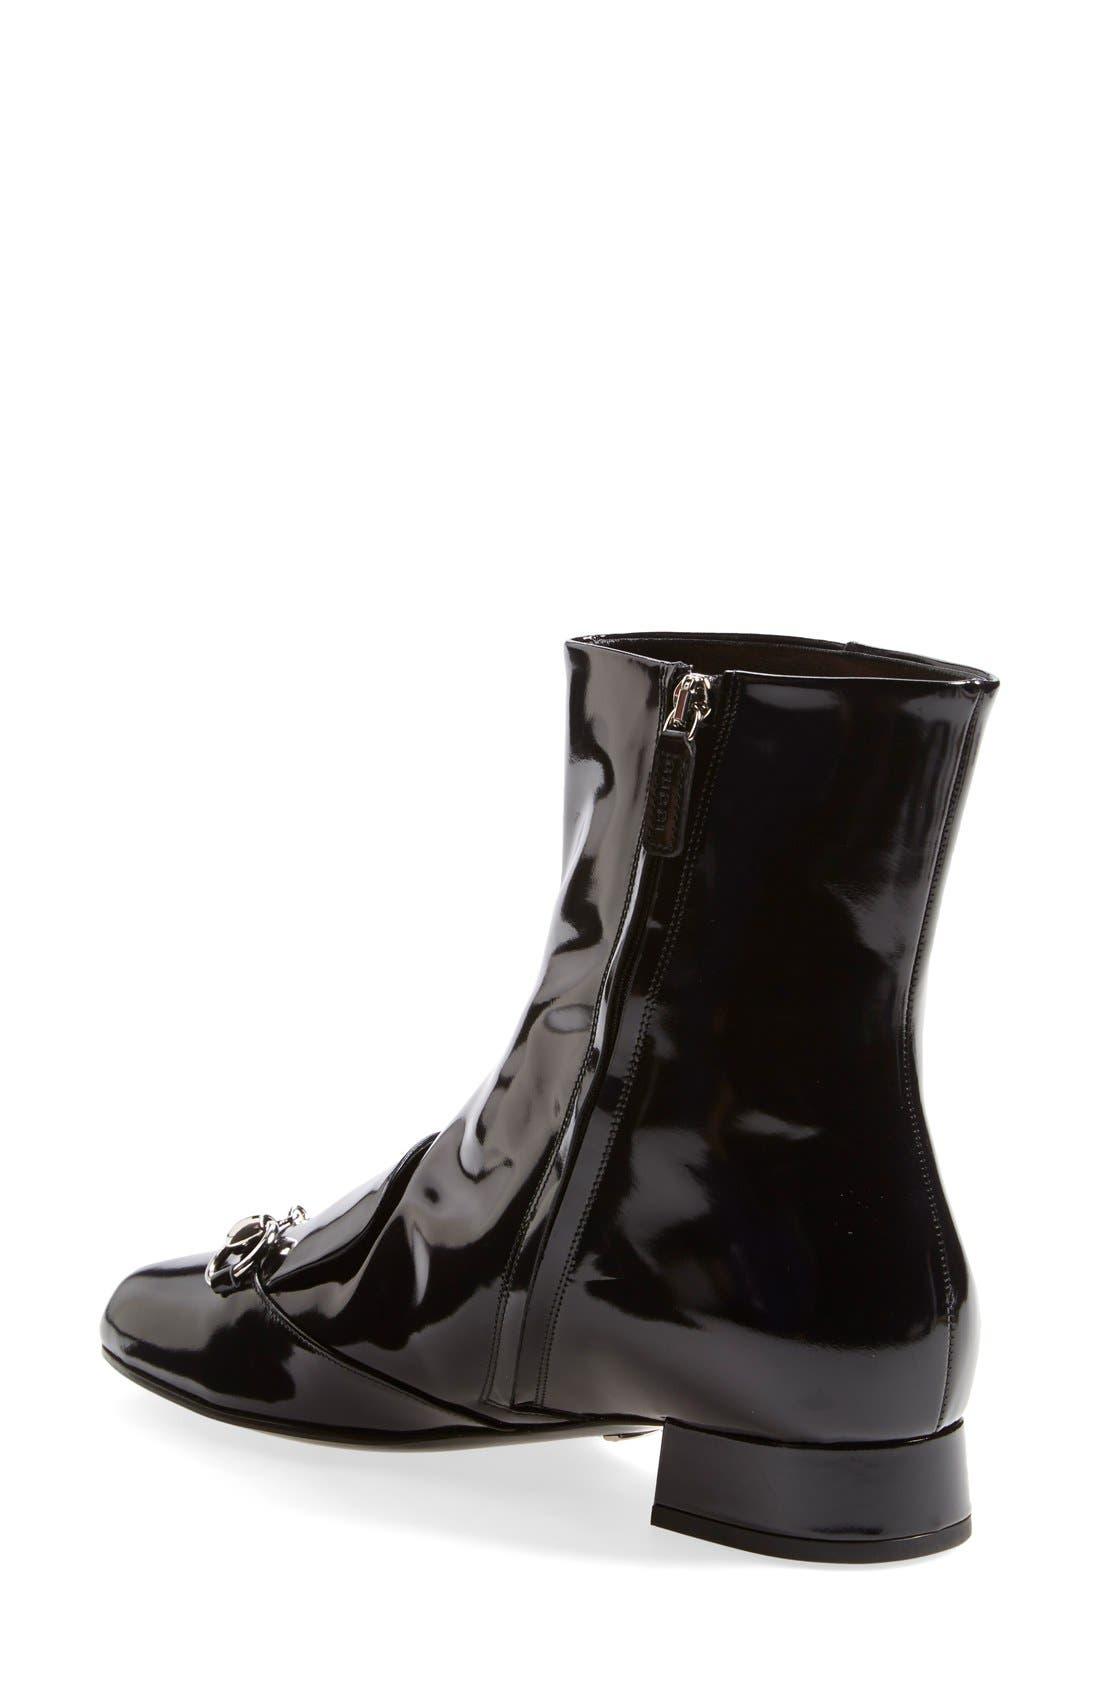 Alternate Image 2  - Gucci 'Lillian' Horsebit Ankle Bootie (Women)